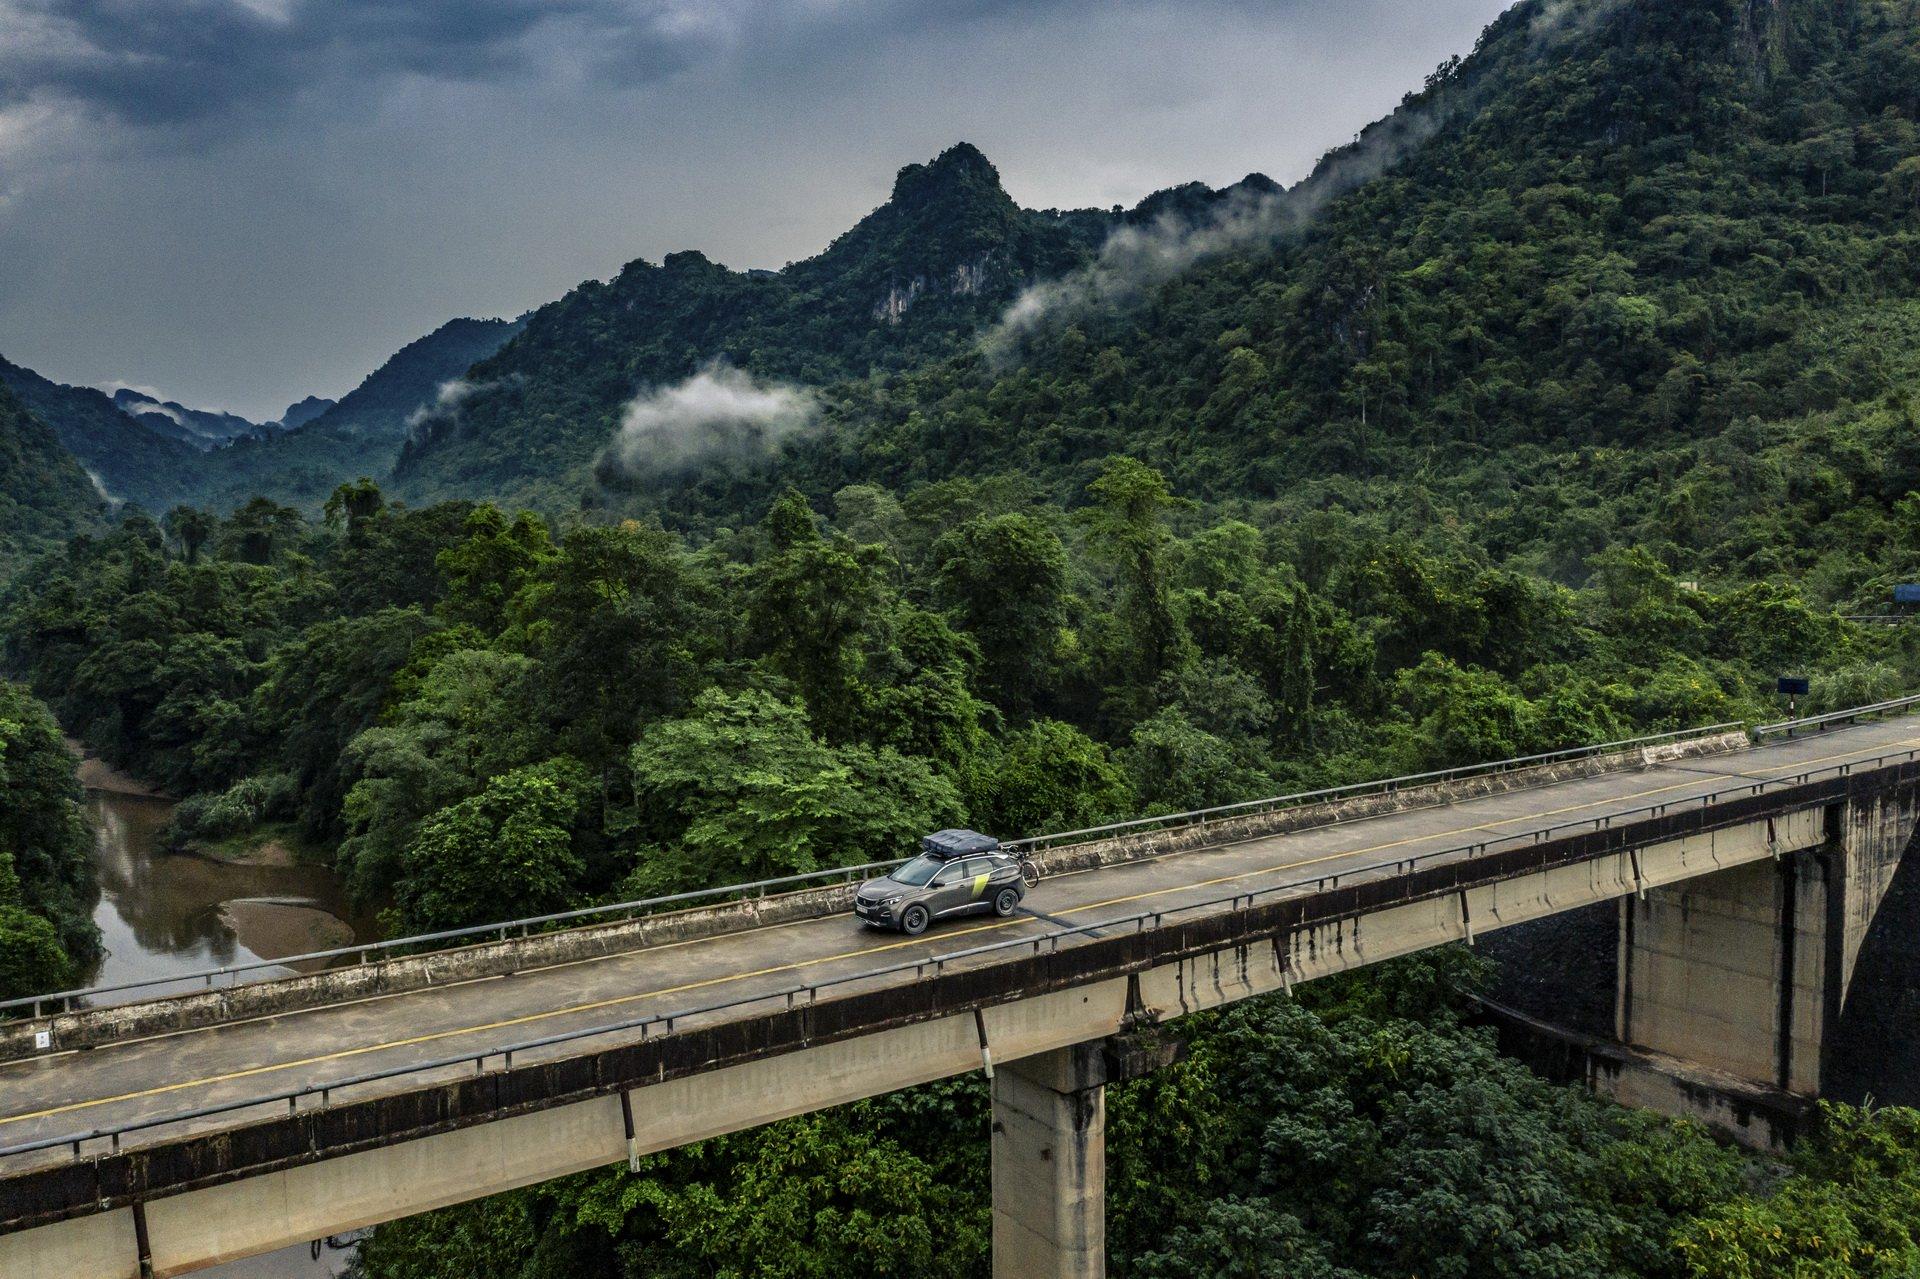 Peugeot-3008-Concept-Vietnam-Adventure-7